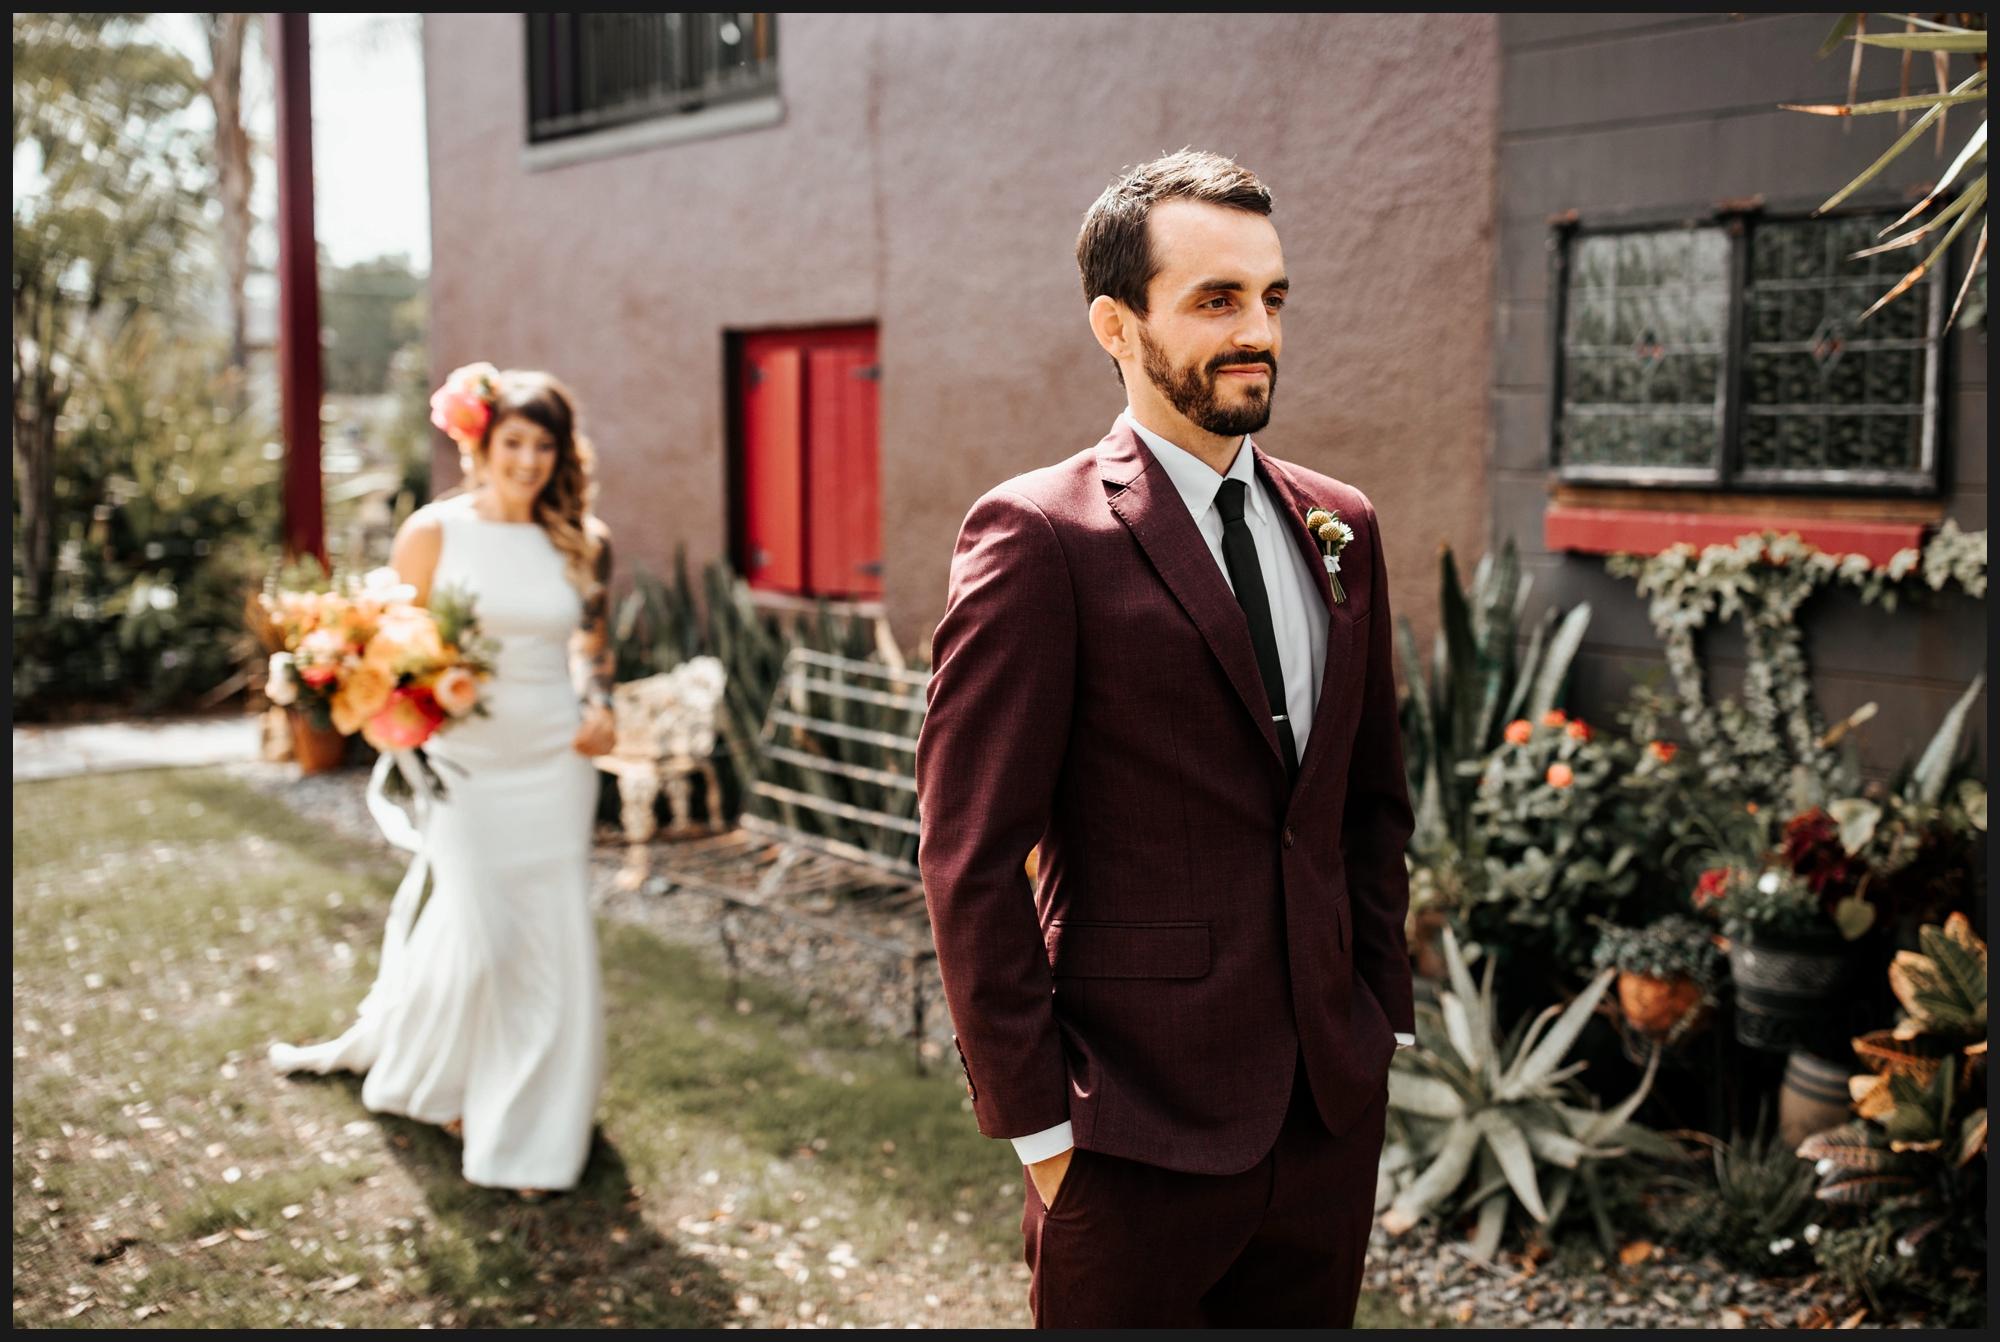 Orlando-Wedding-Photographer-destination-wedding-photographer-florida-wedding-photographer-bohemian-wedding-photographer_1971.jpg